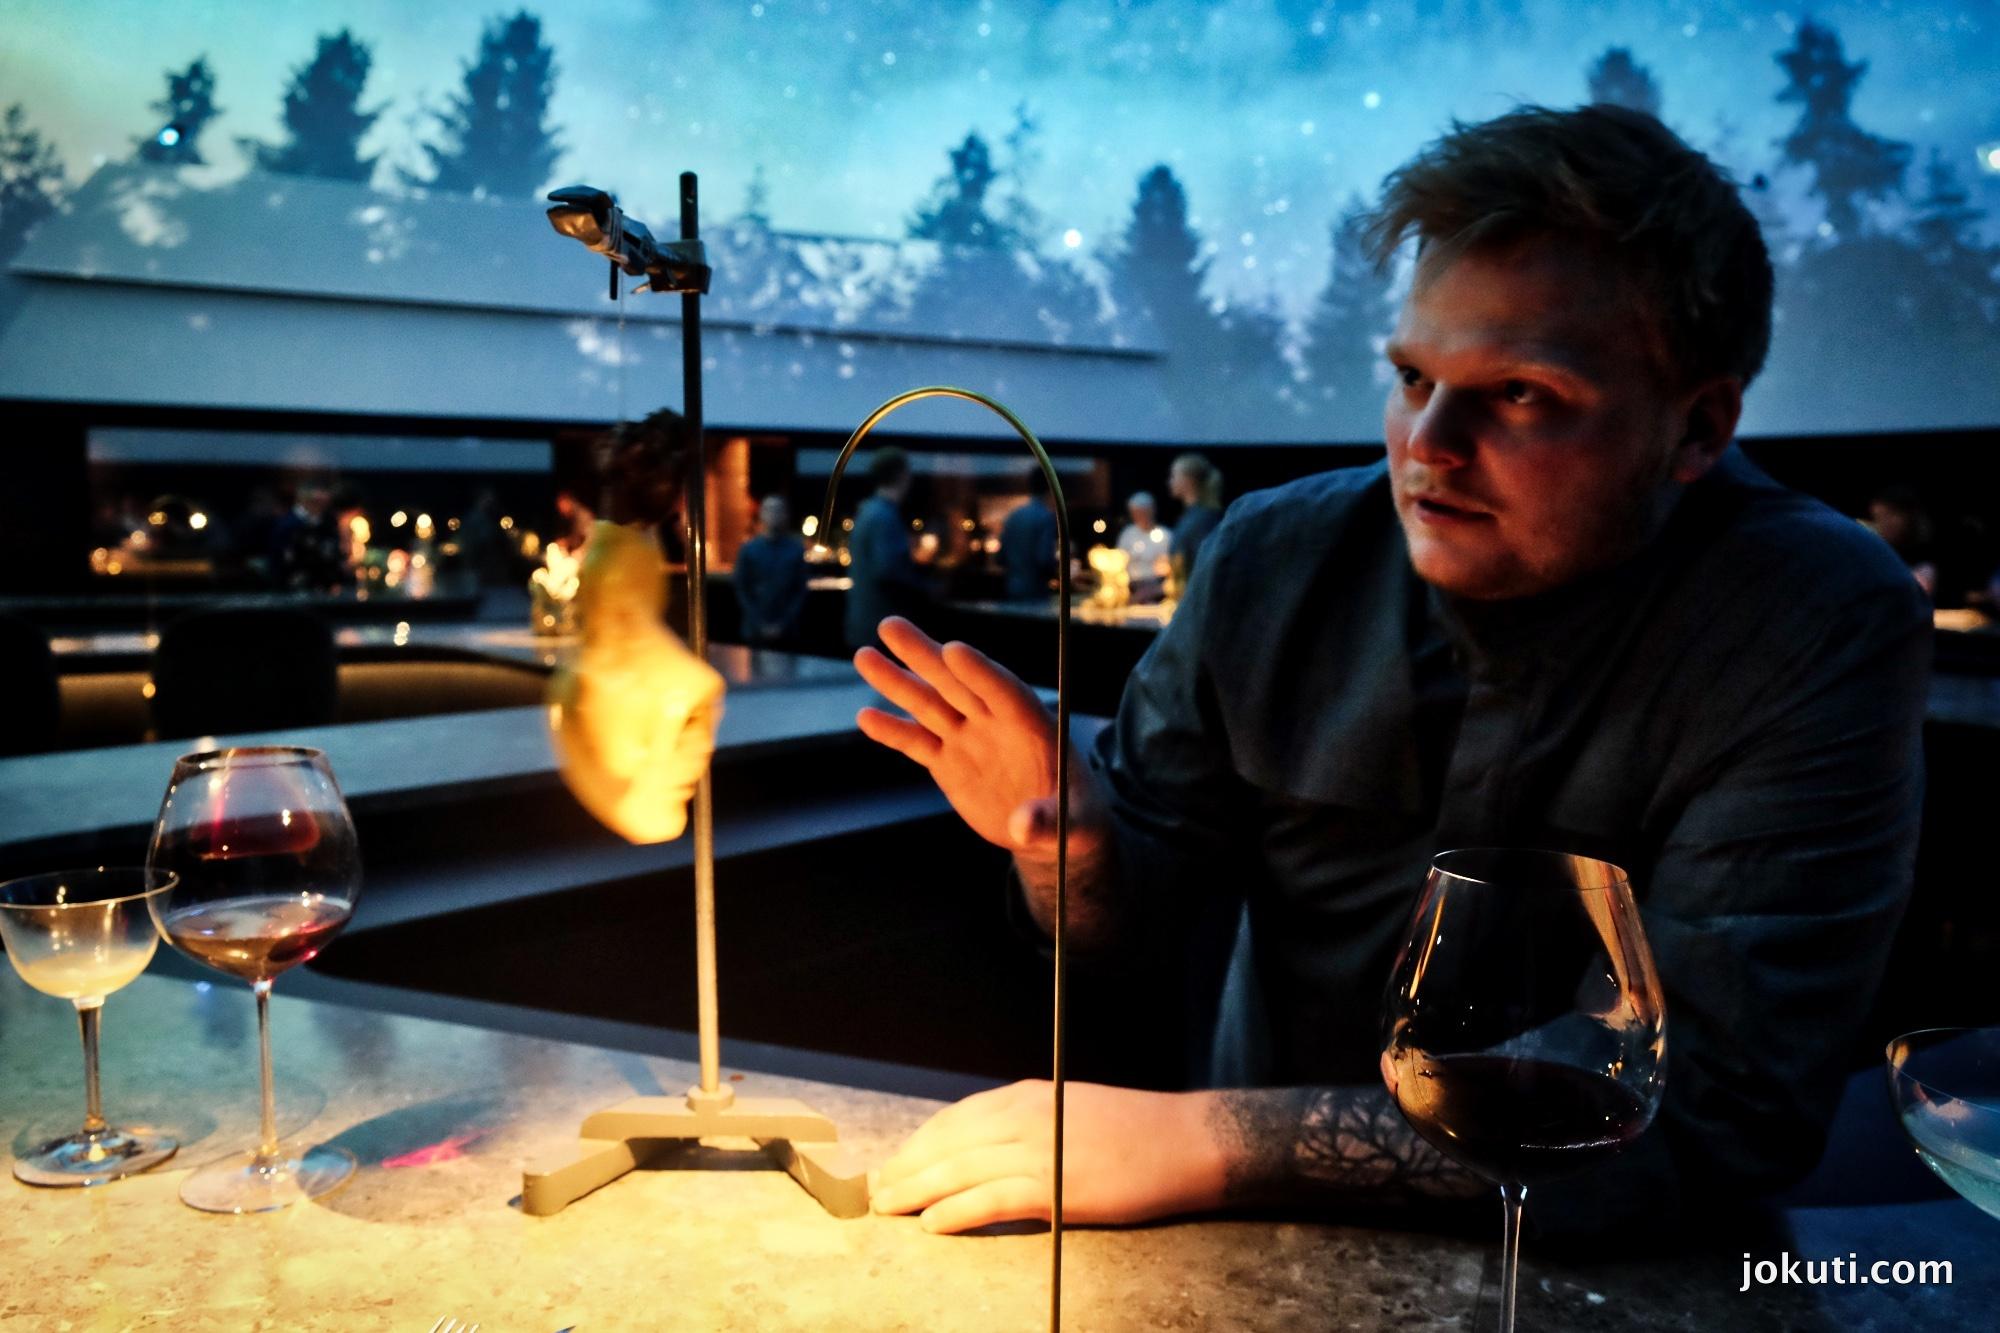 dscf7302_alchemist_copenhagen_rasmus_munk_holistic_dining_restaurant_denmark_vilagevo_jokuti_andras_l.jpg